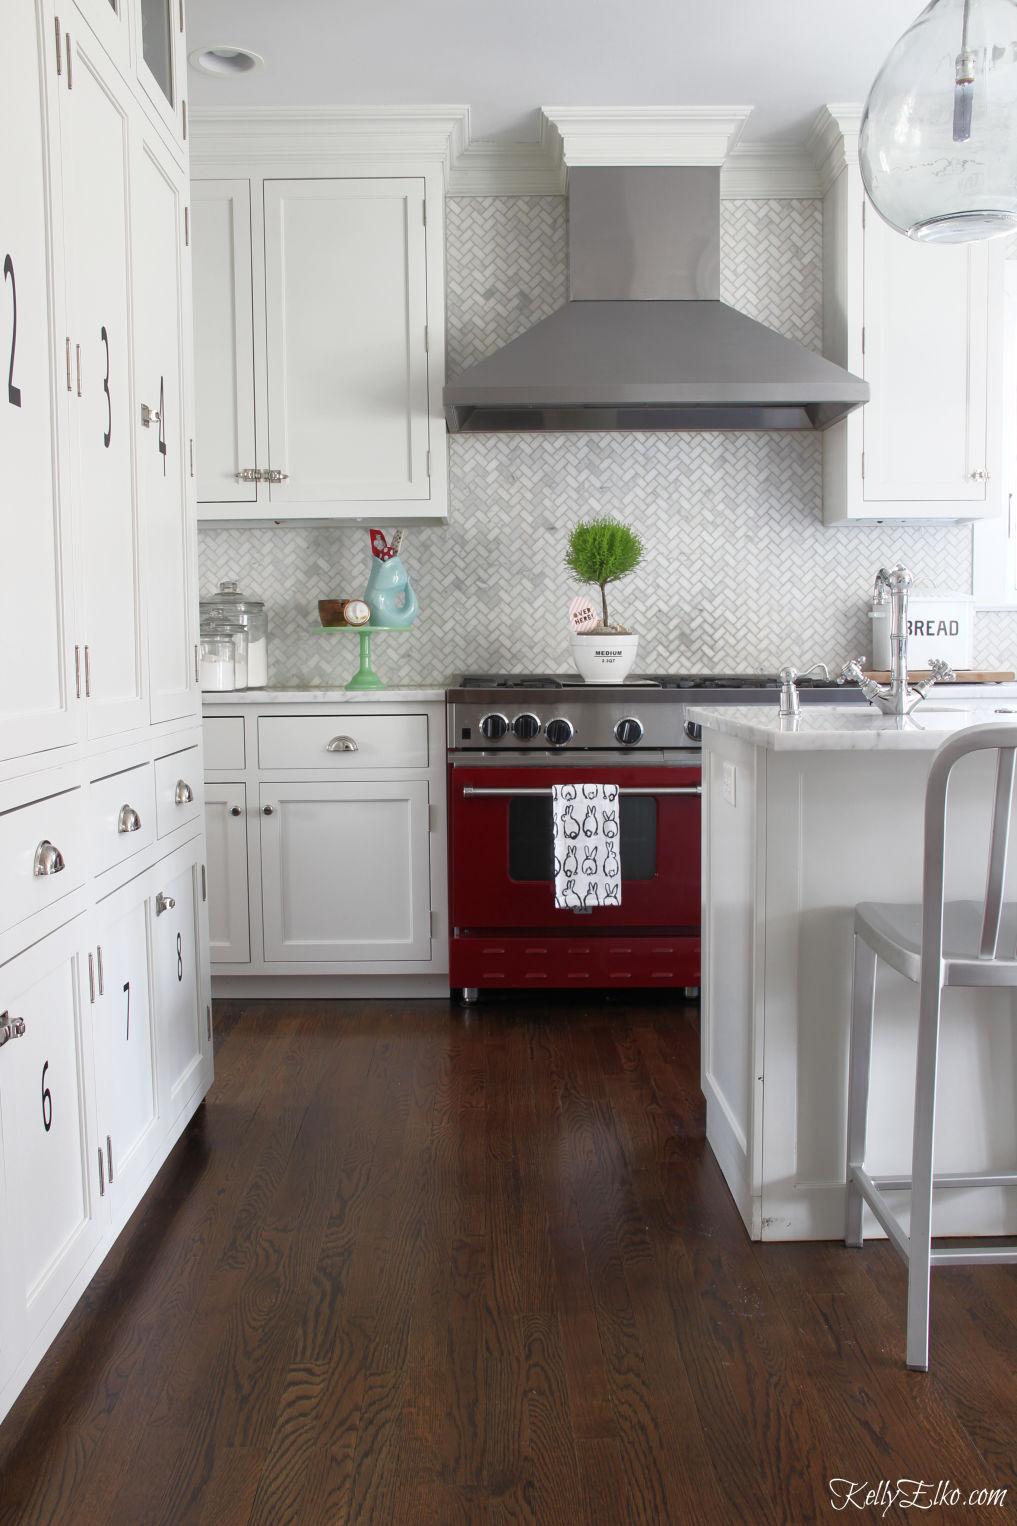 White kitchen with stunning red stove and marble herringbone backsplash kellyelko.com #whitekitchen #redstove #backsplash #farmhousekitchen #cottagekitchen #classickitchen #whitecabinets #kitchendecor #kitchenreno #kellyelko